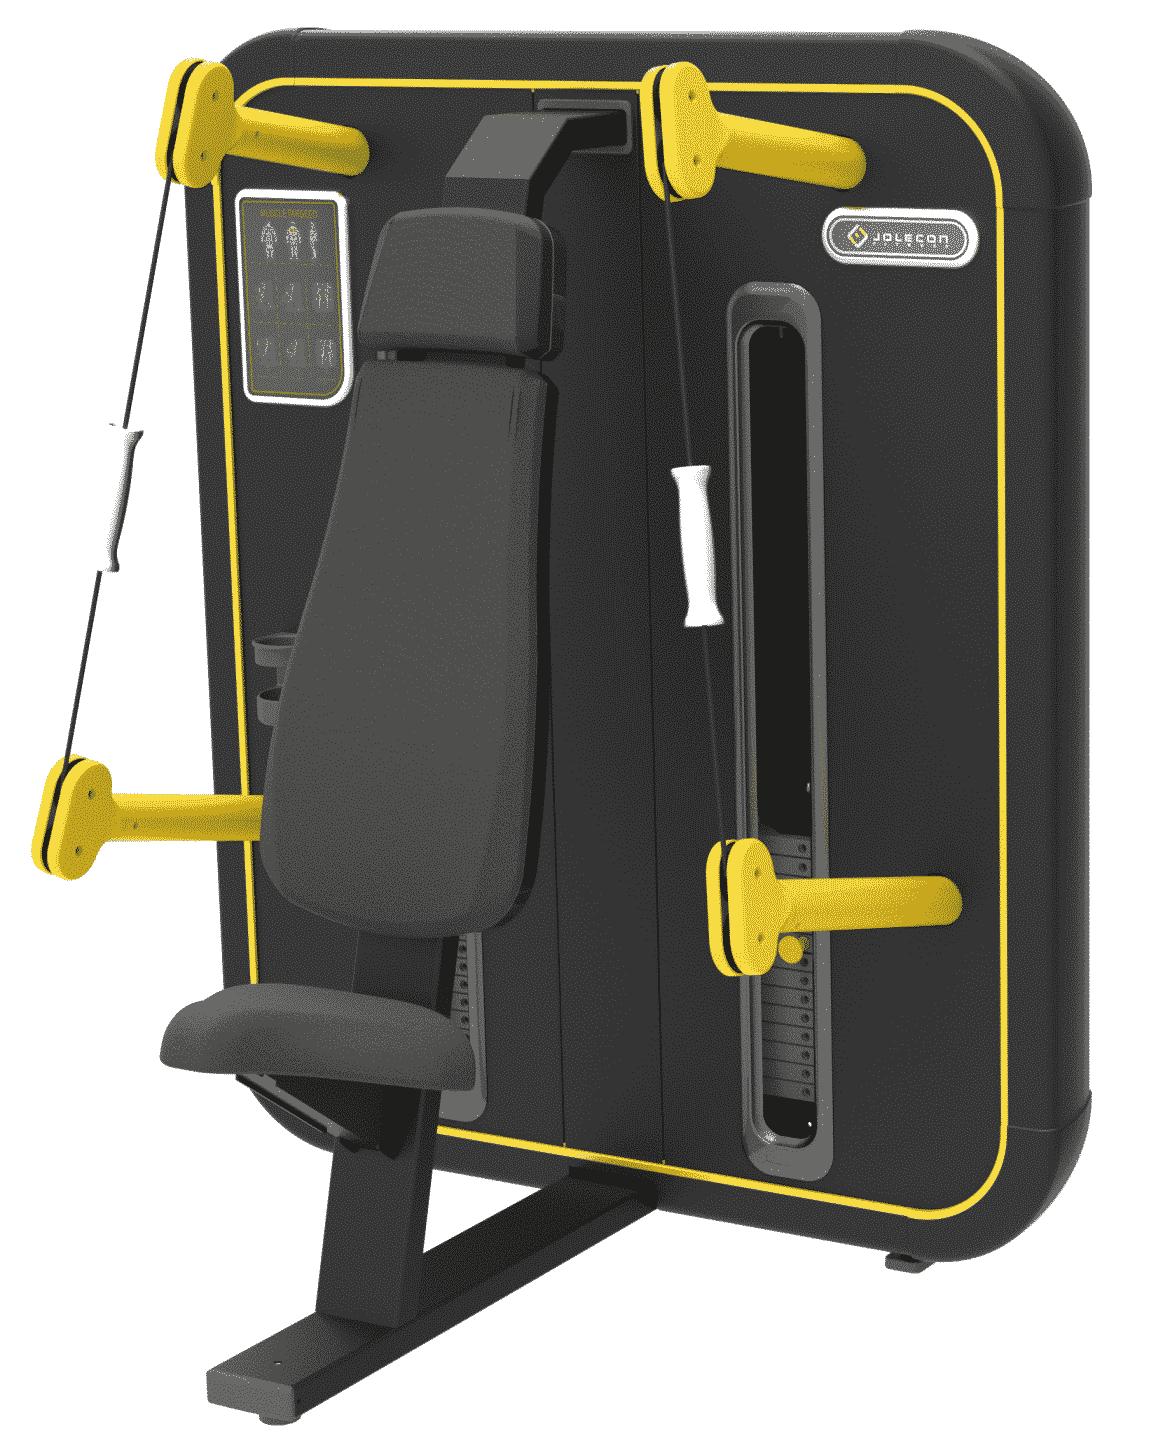 Machine de musculationChest Press KNFIT